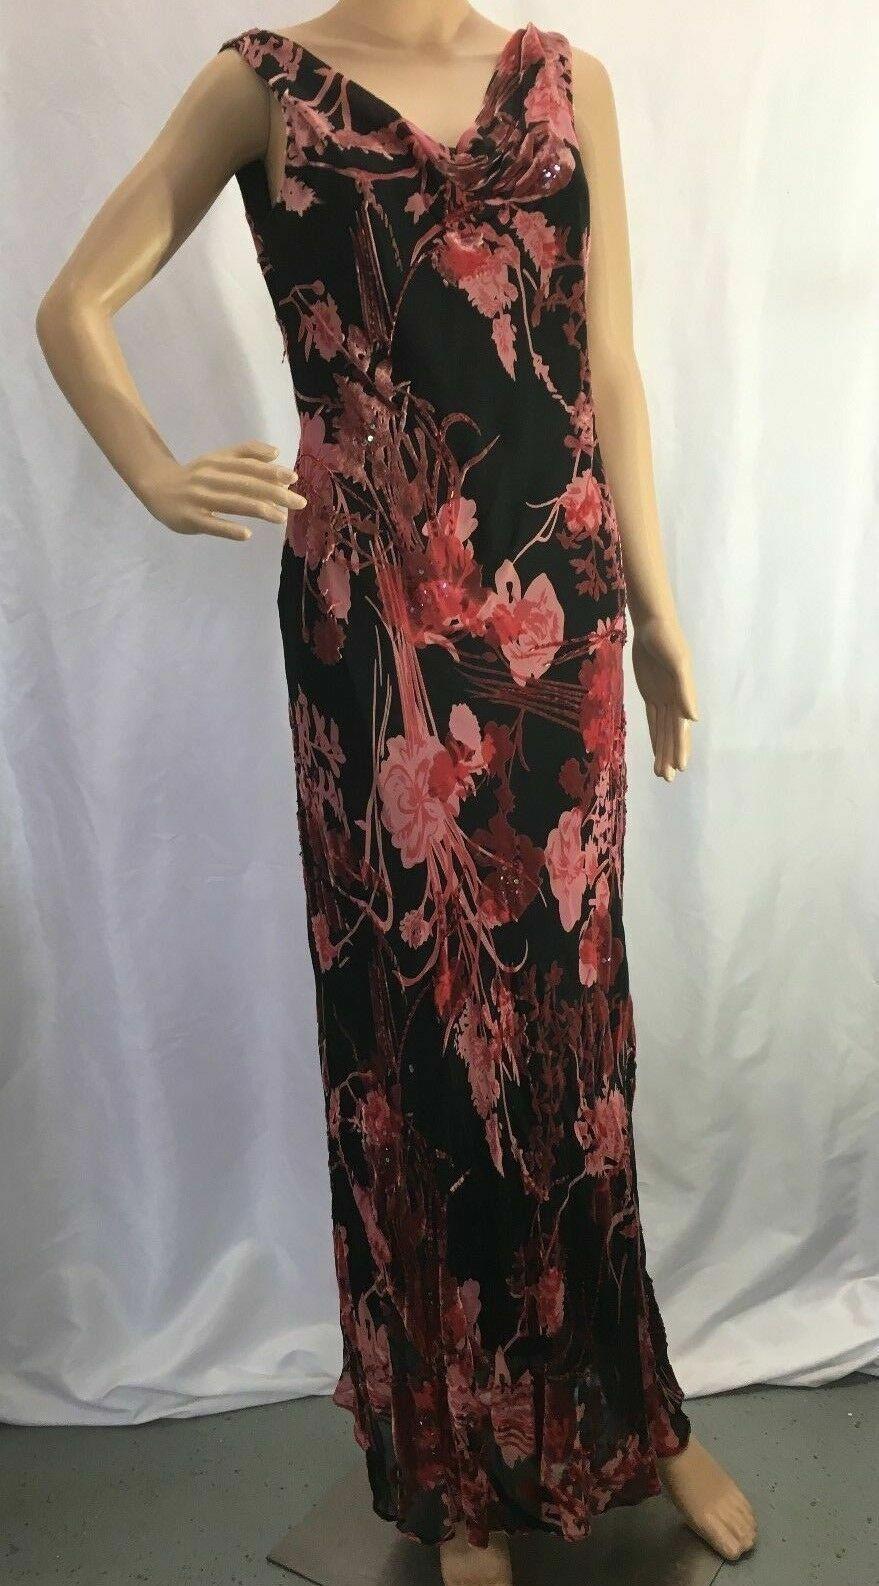 Women's Alex Evenings Formal Floral Black, Red, Rose Beaded Long Dress Sz 10 EUC